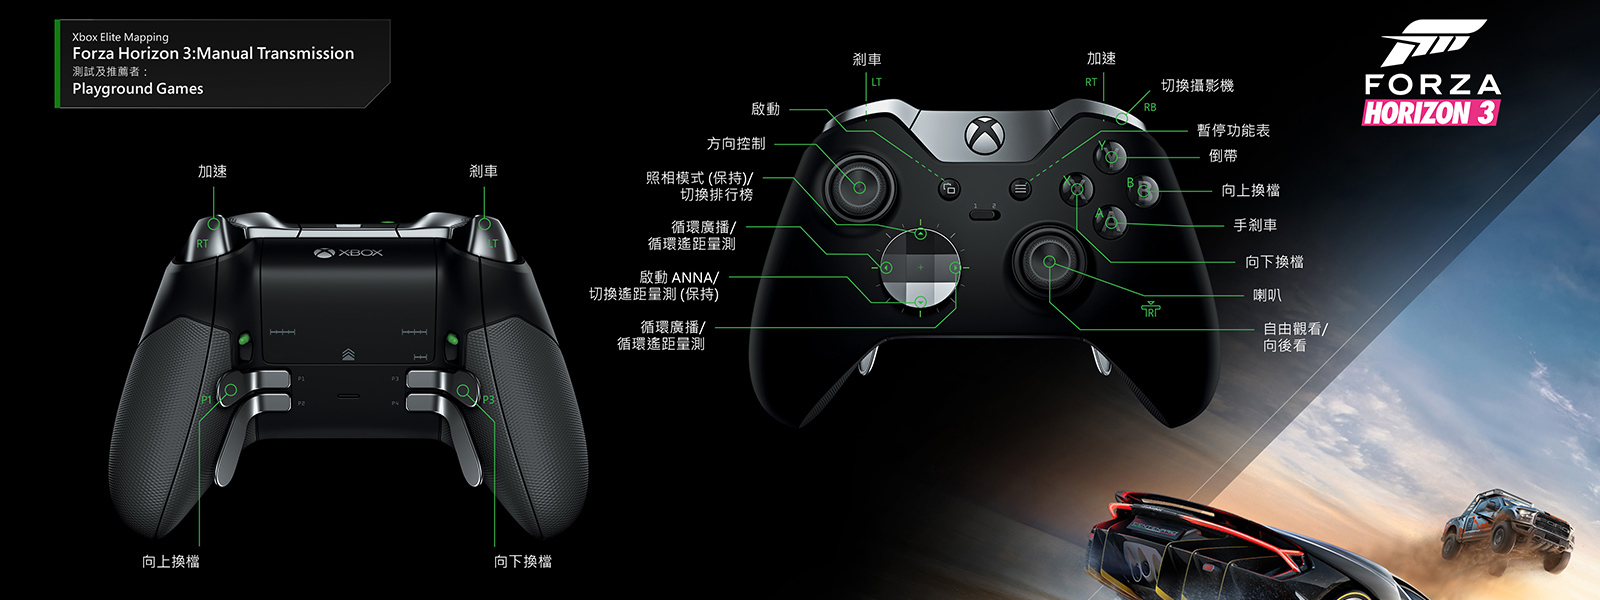 Forza Horizon 3 – Manual Transmission Elite 配對功能